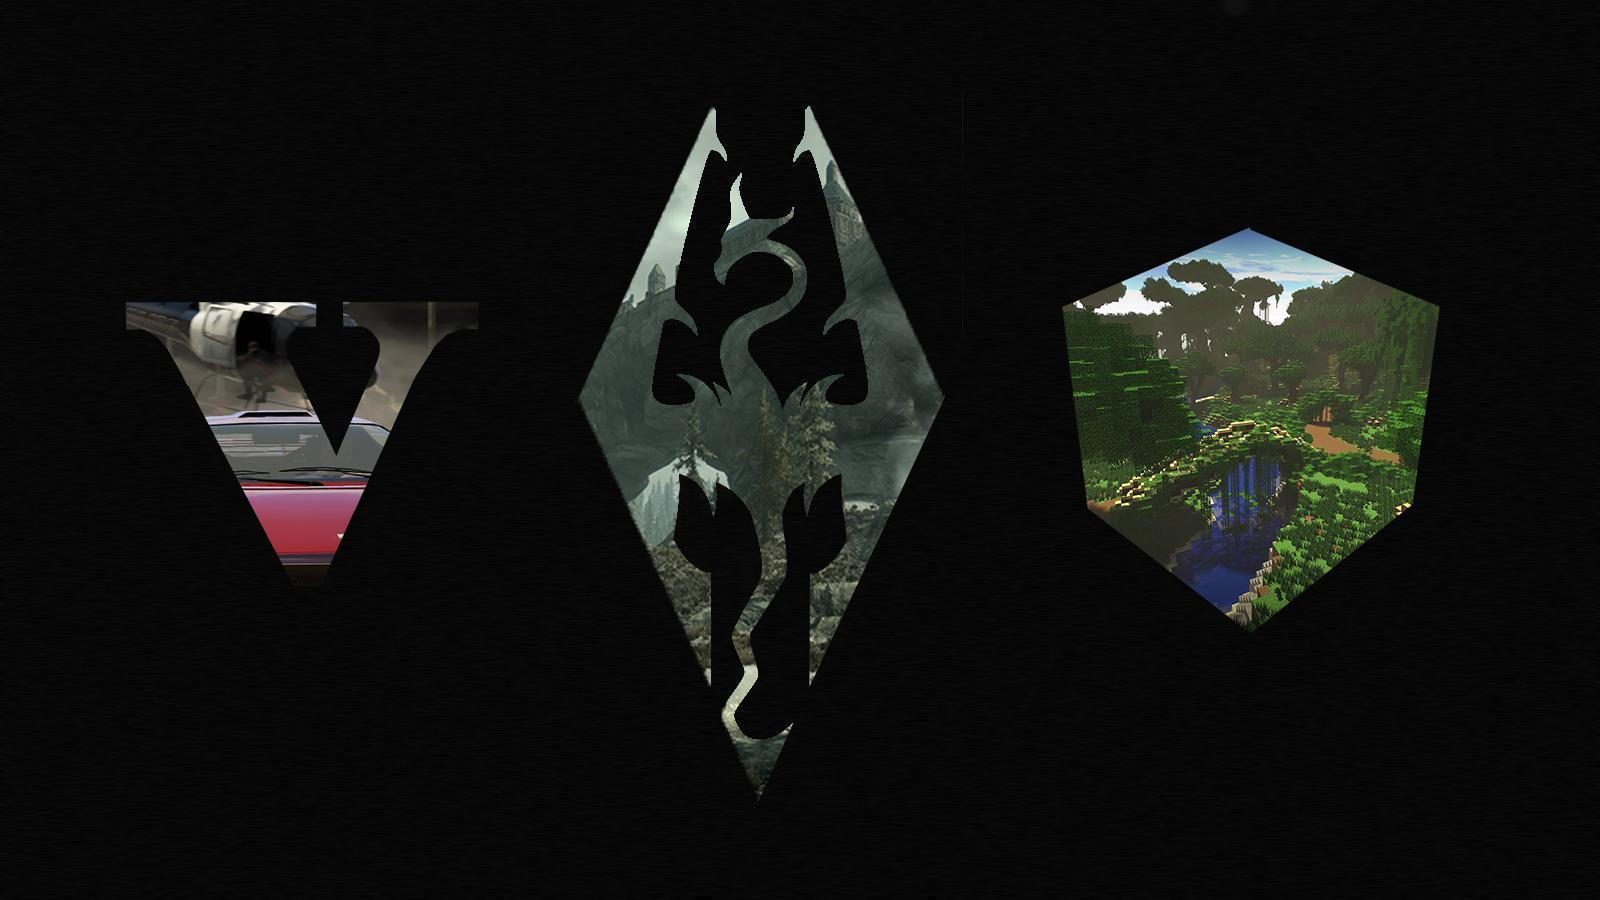 GTAV Skyrim Minecraft Wallpaper I Made 1600x900